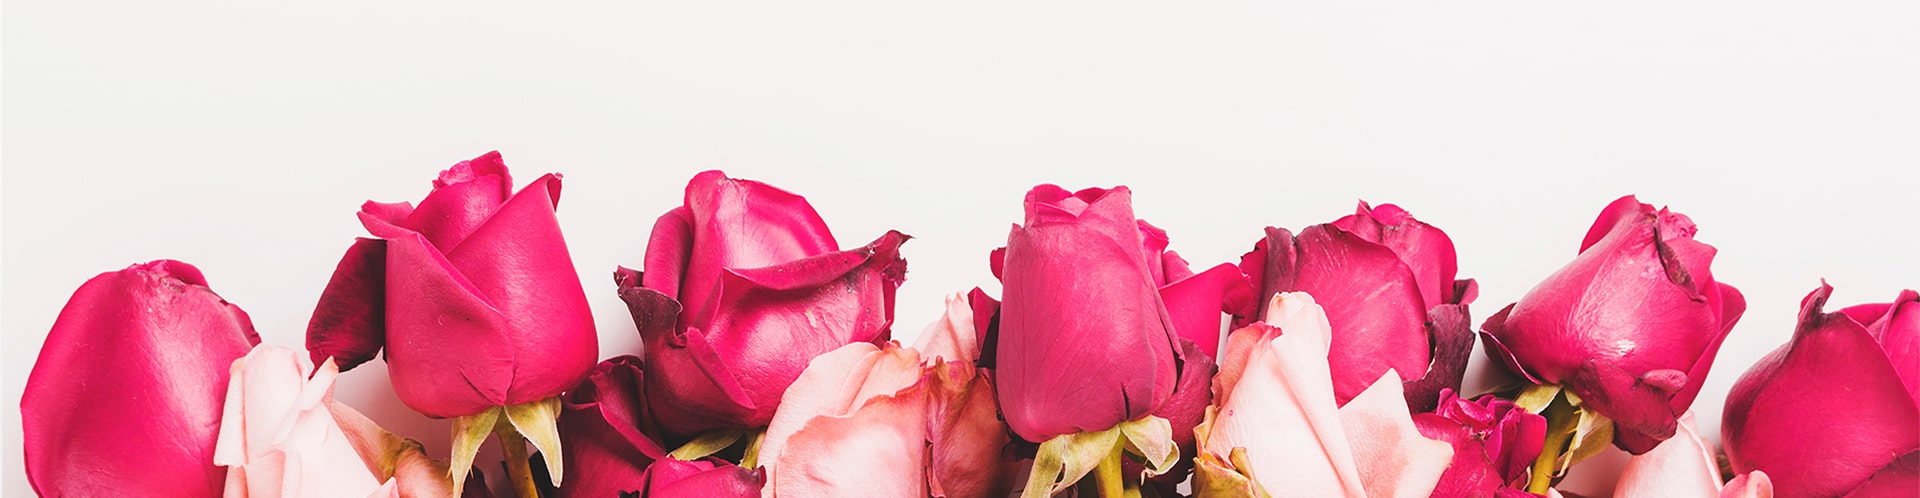 kwiaciarnia mercedes kwiaty